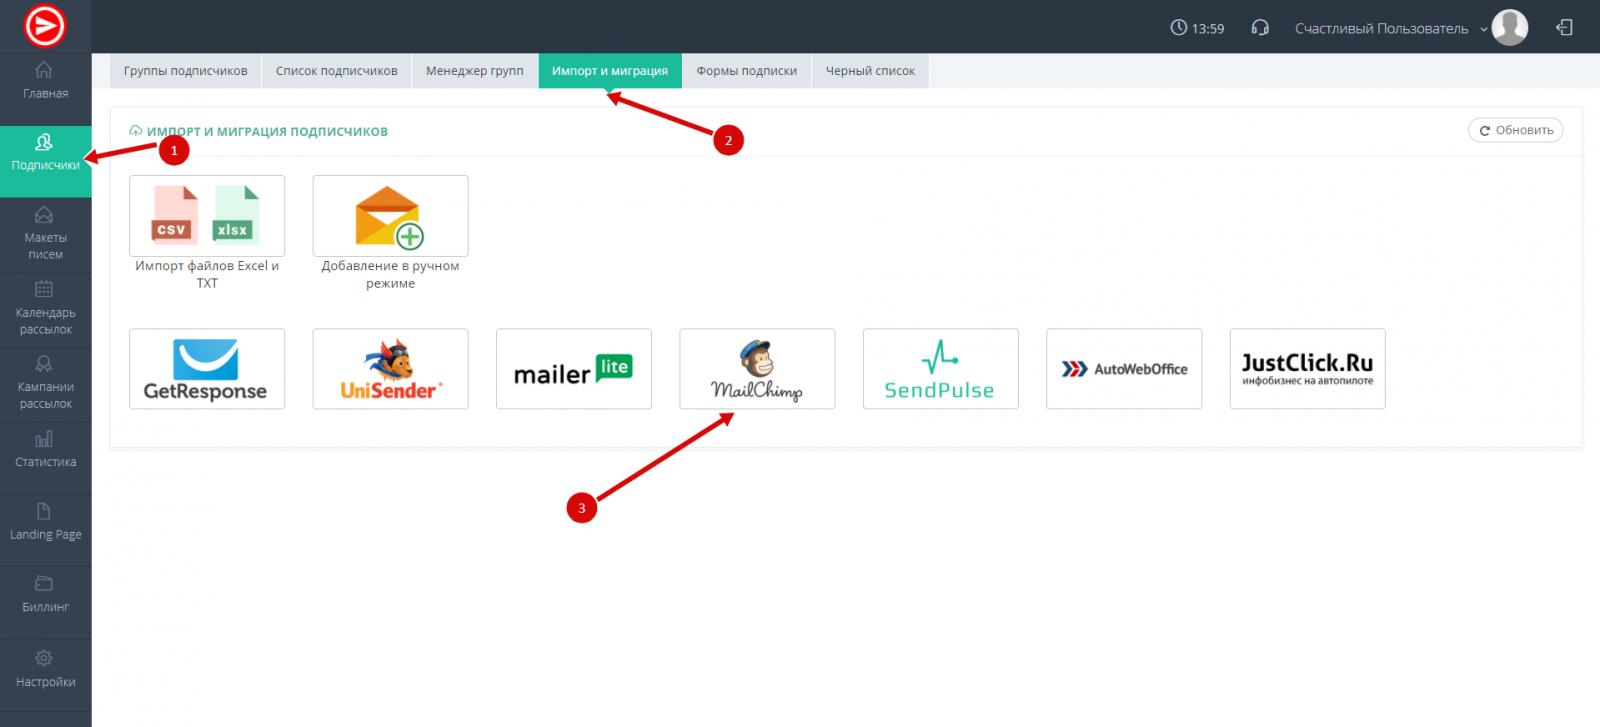 Миграция  с сервиса MailChimp в сервис Estismail